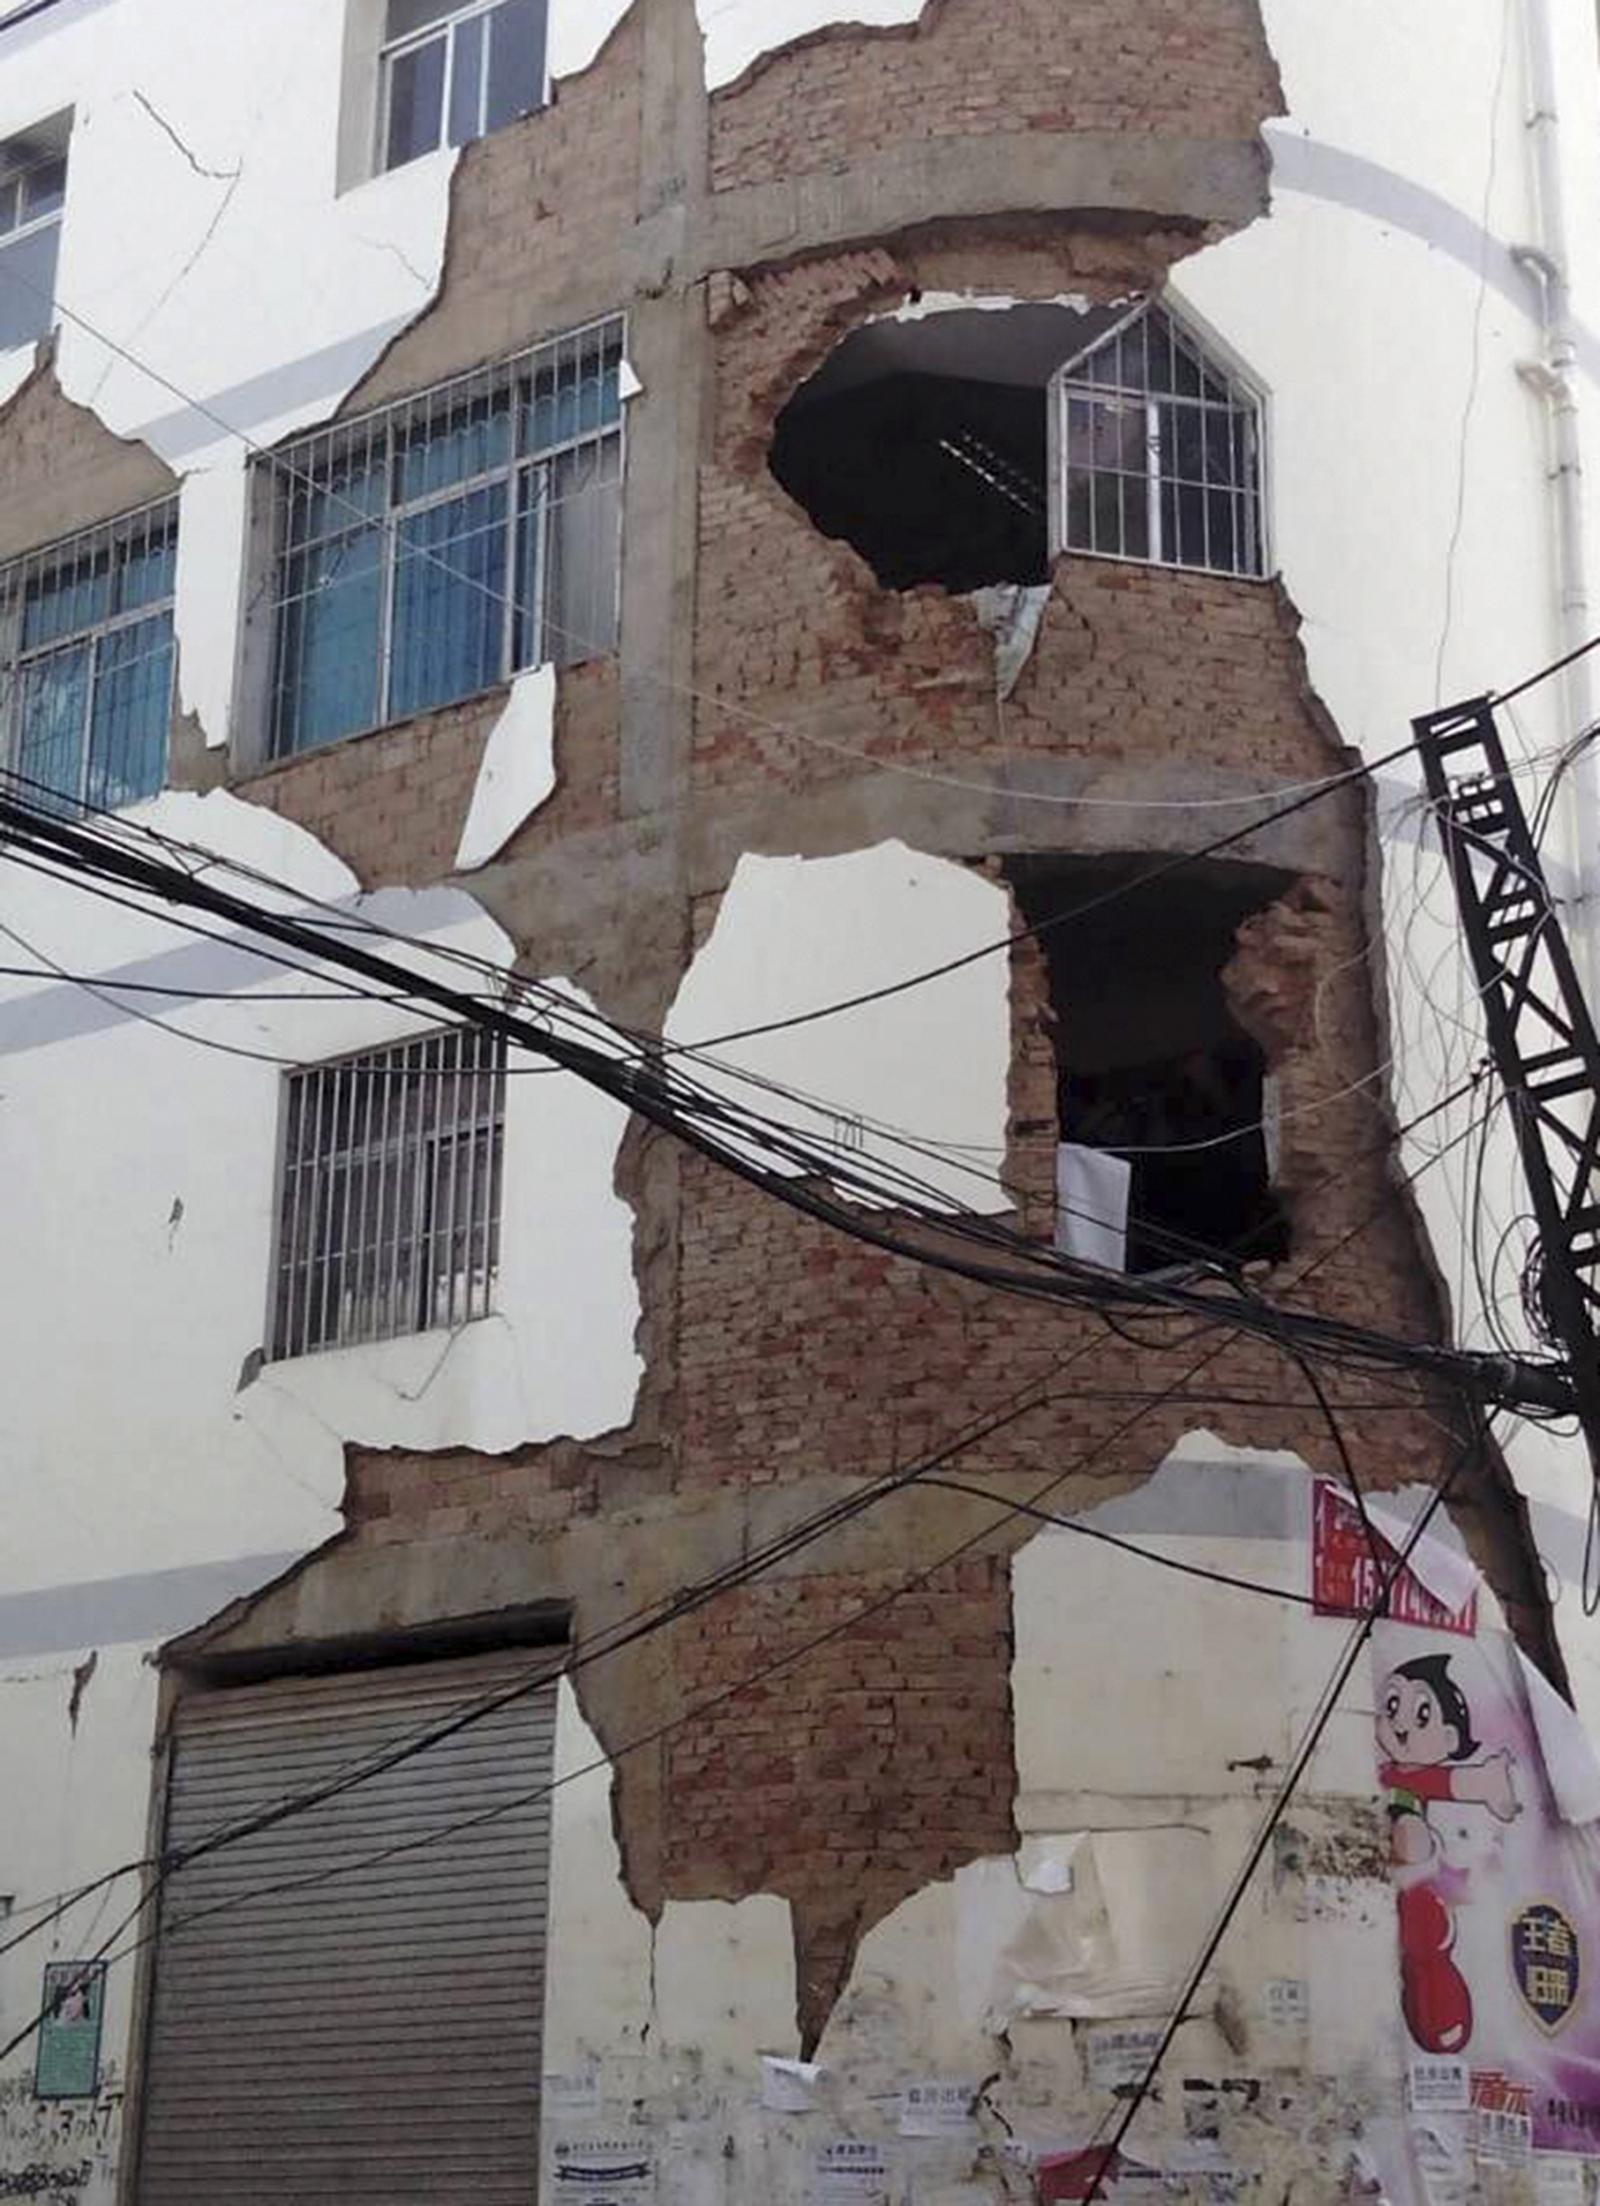 Yunnan Earthquake damaged building